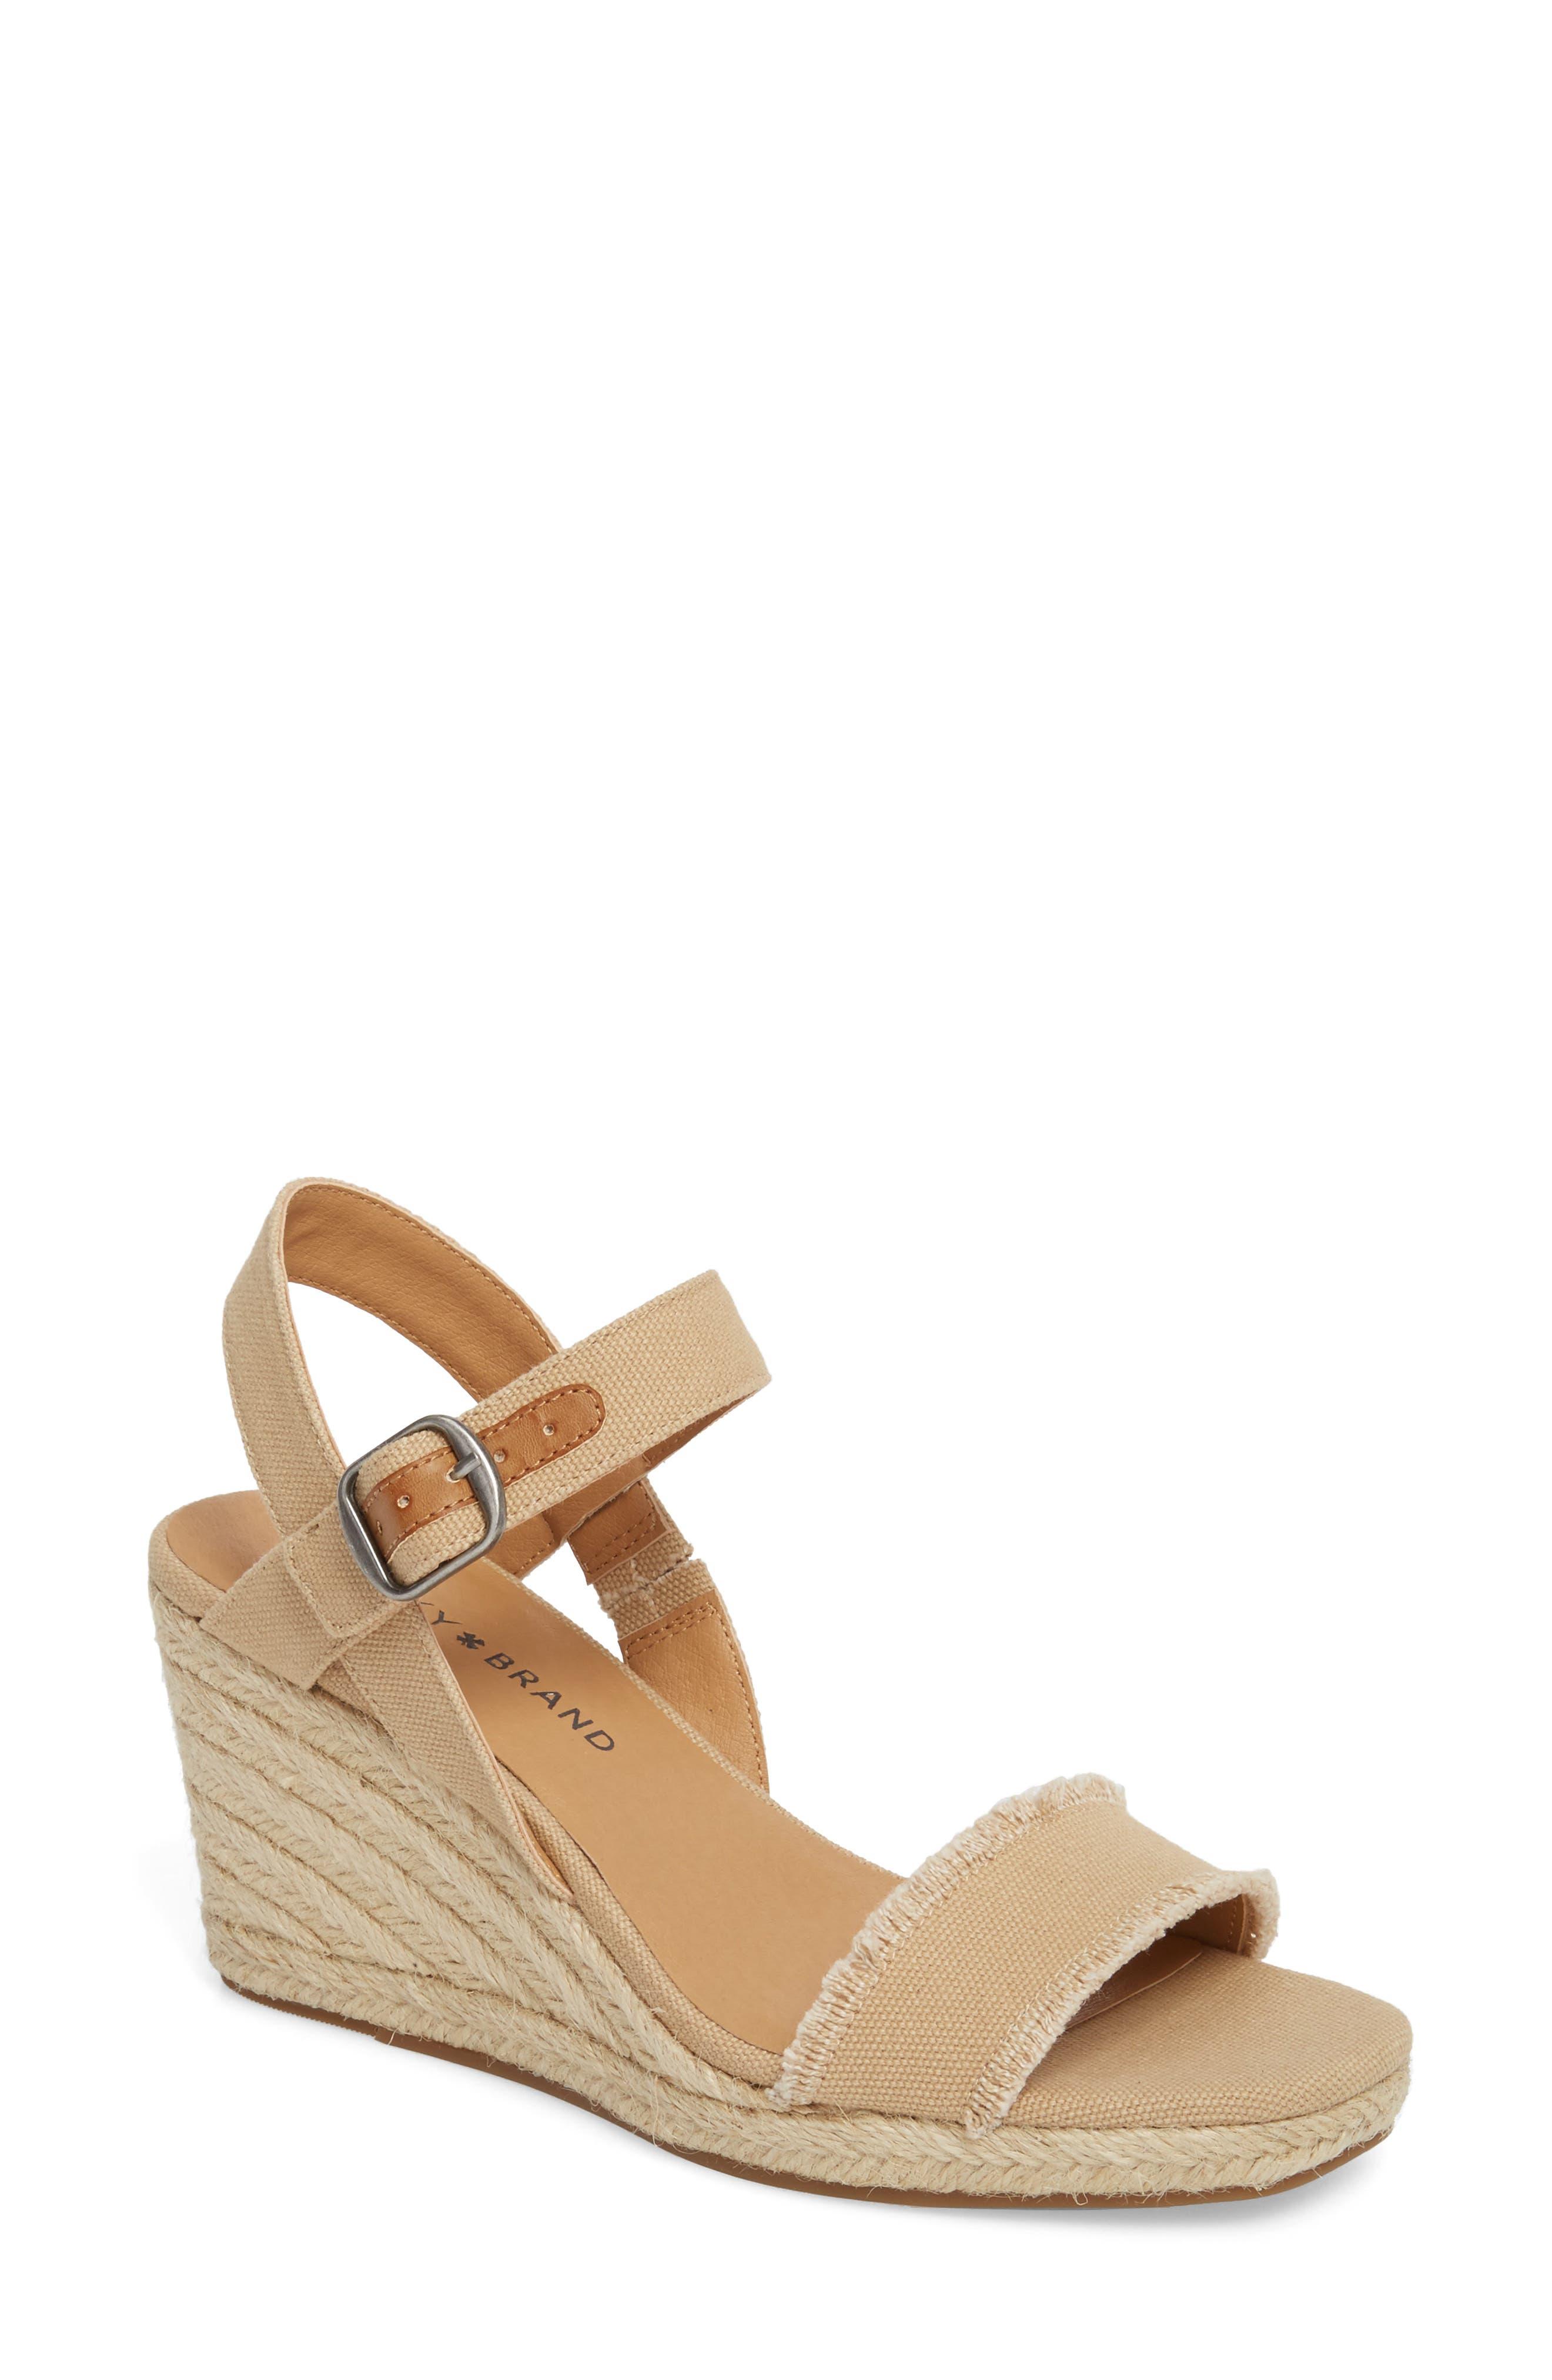 Marceline Squared Toe Wedge Sandal,                             Main thumbnail 3, color,